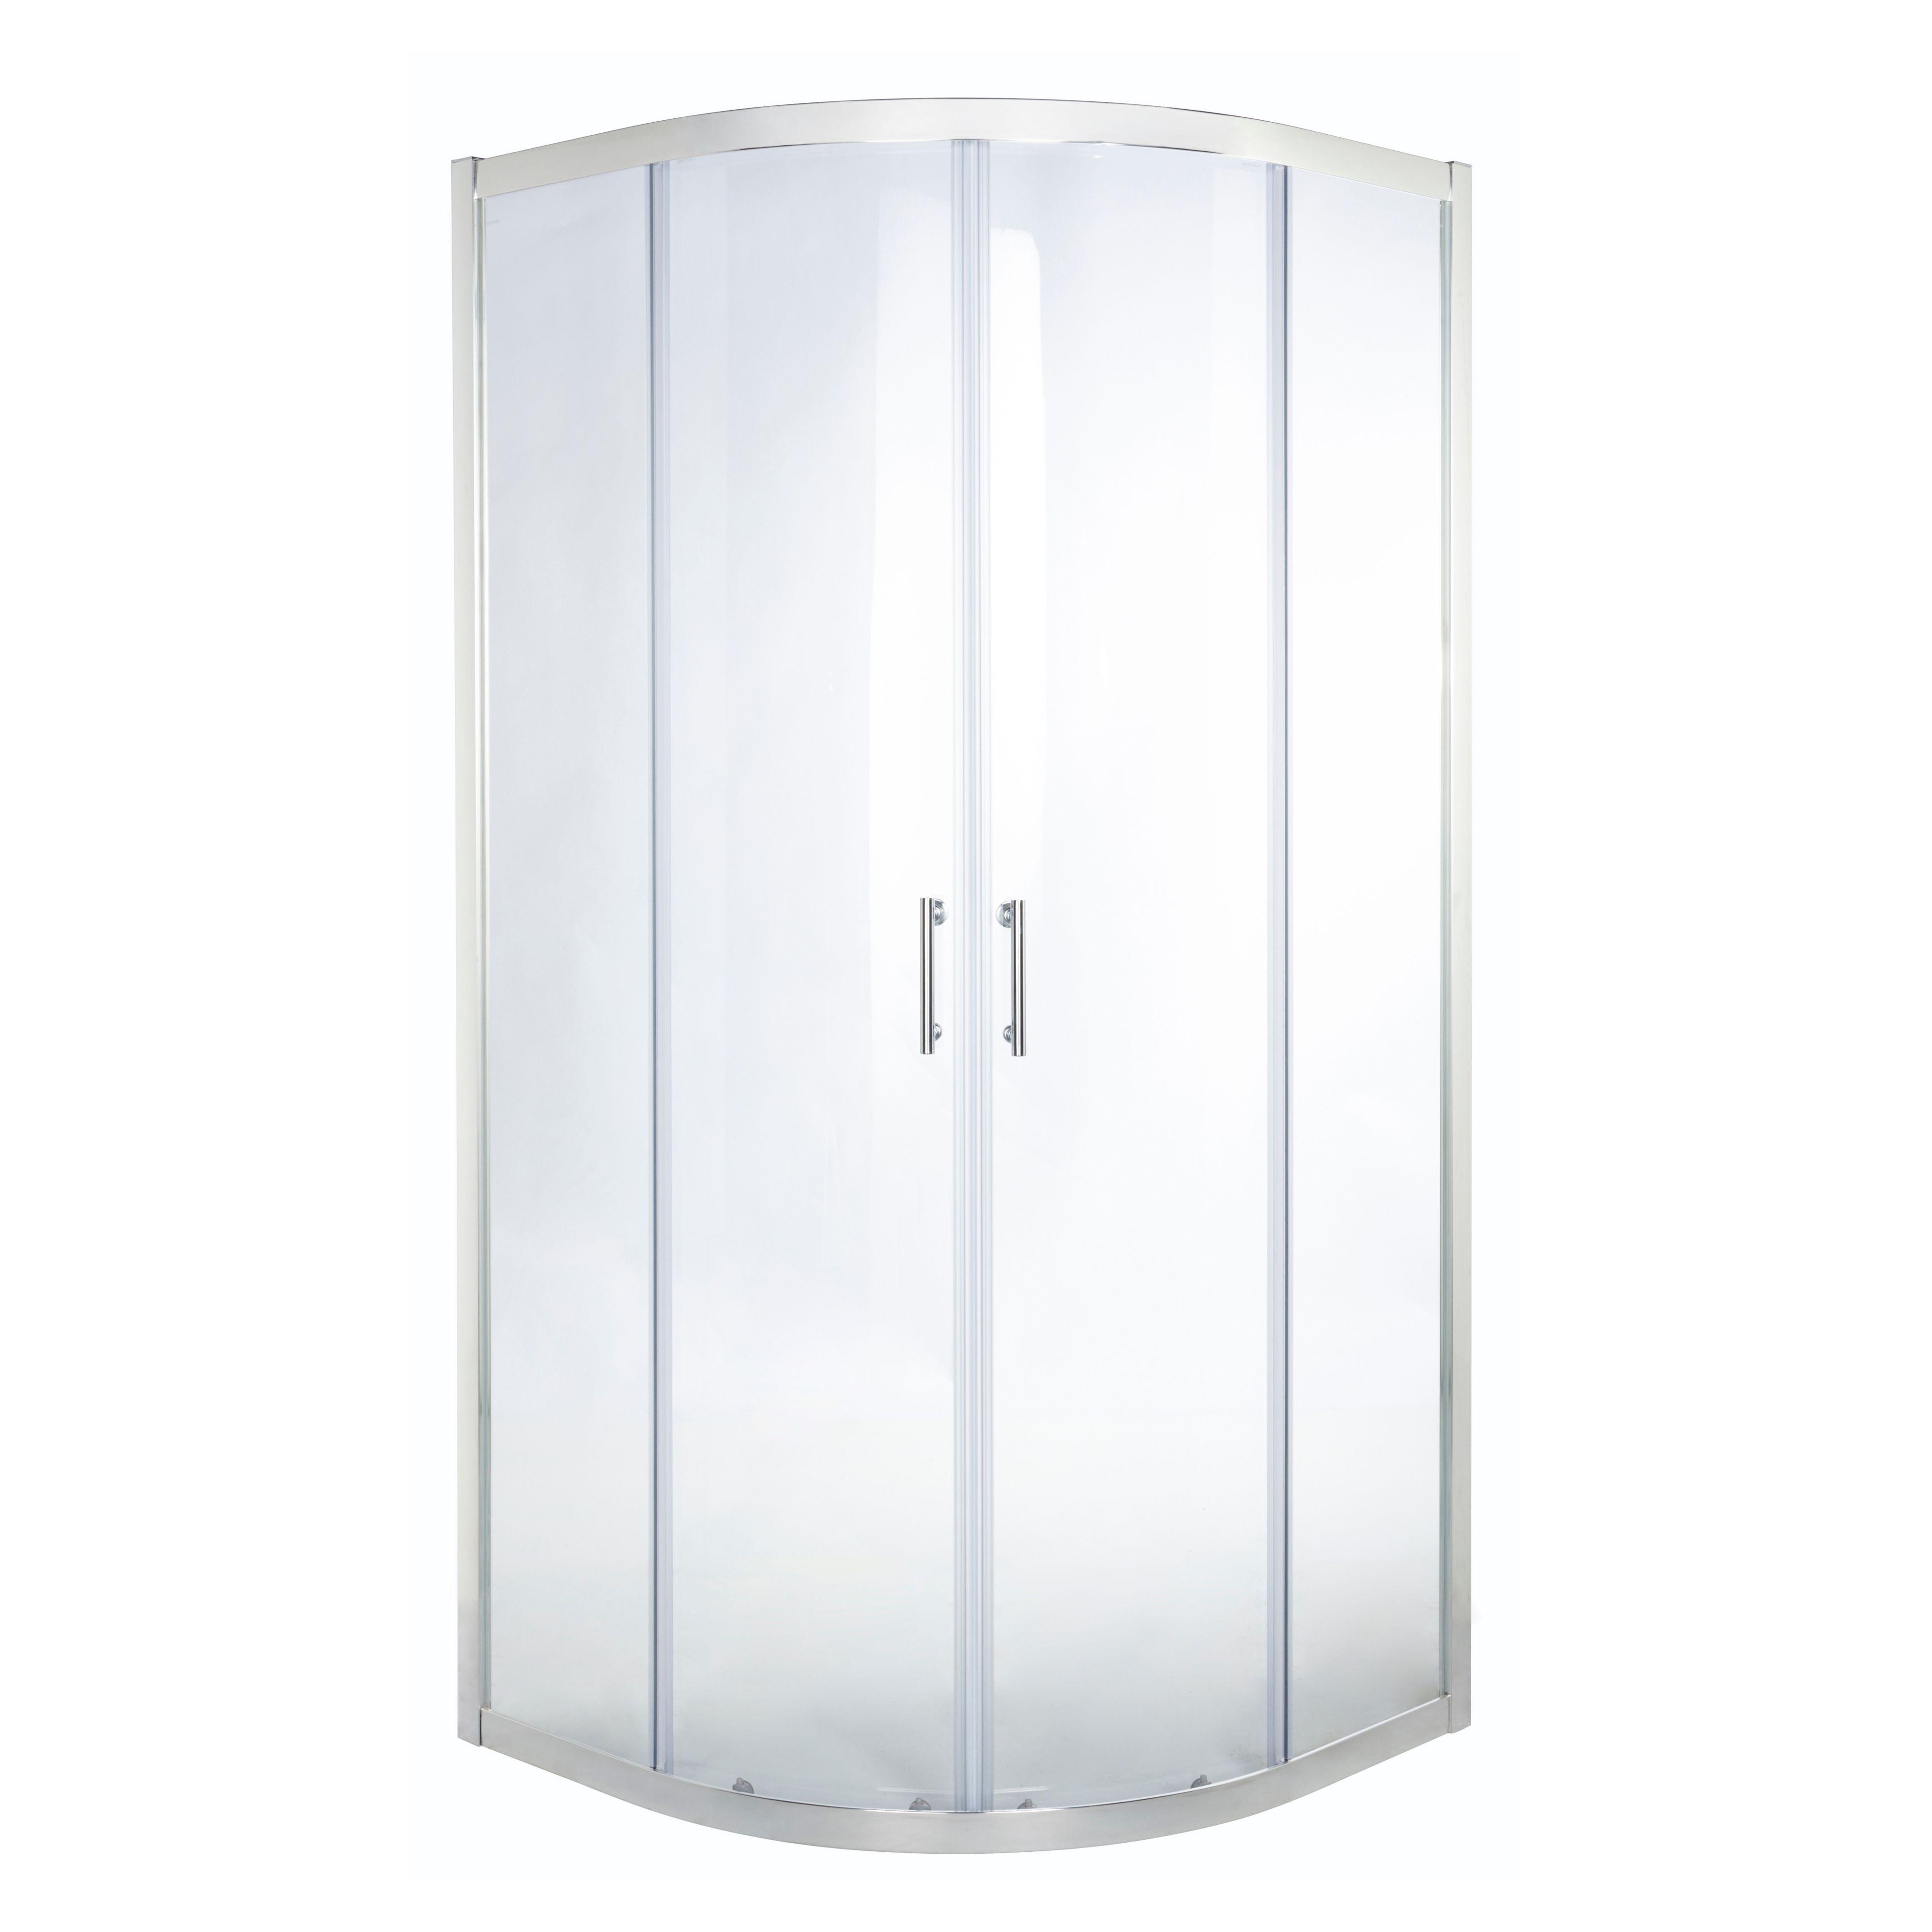 Cooke Lewis Onega Quadrant Shower Enclosure With Corner Entry